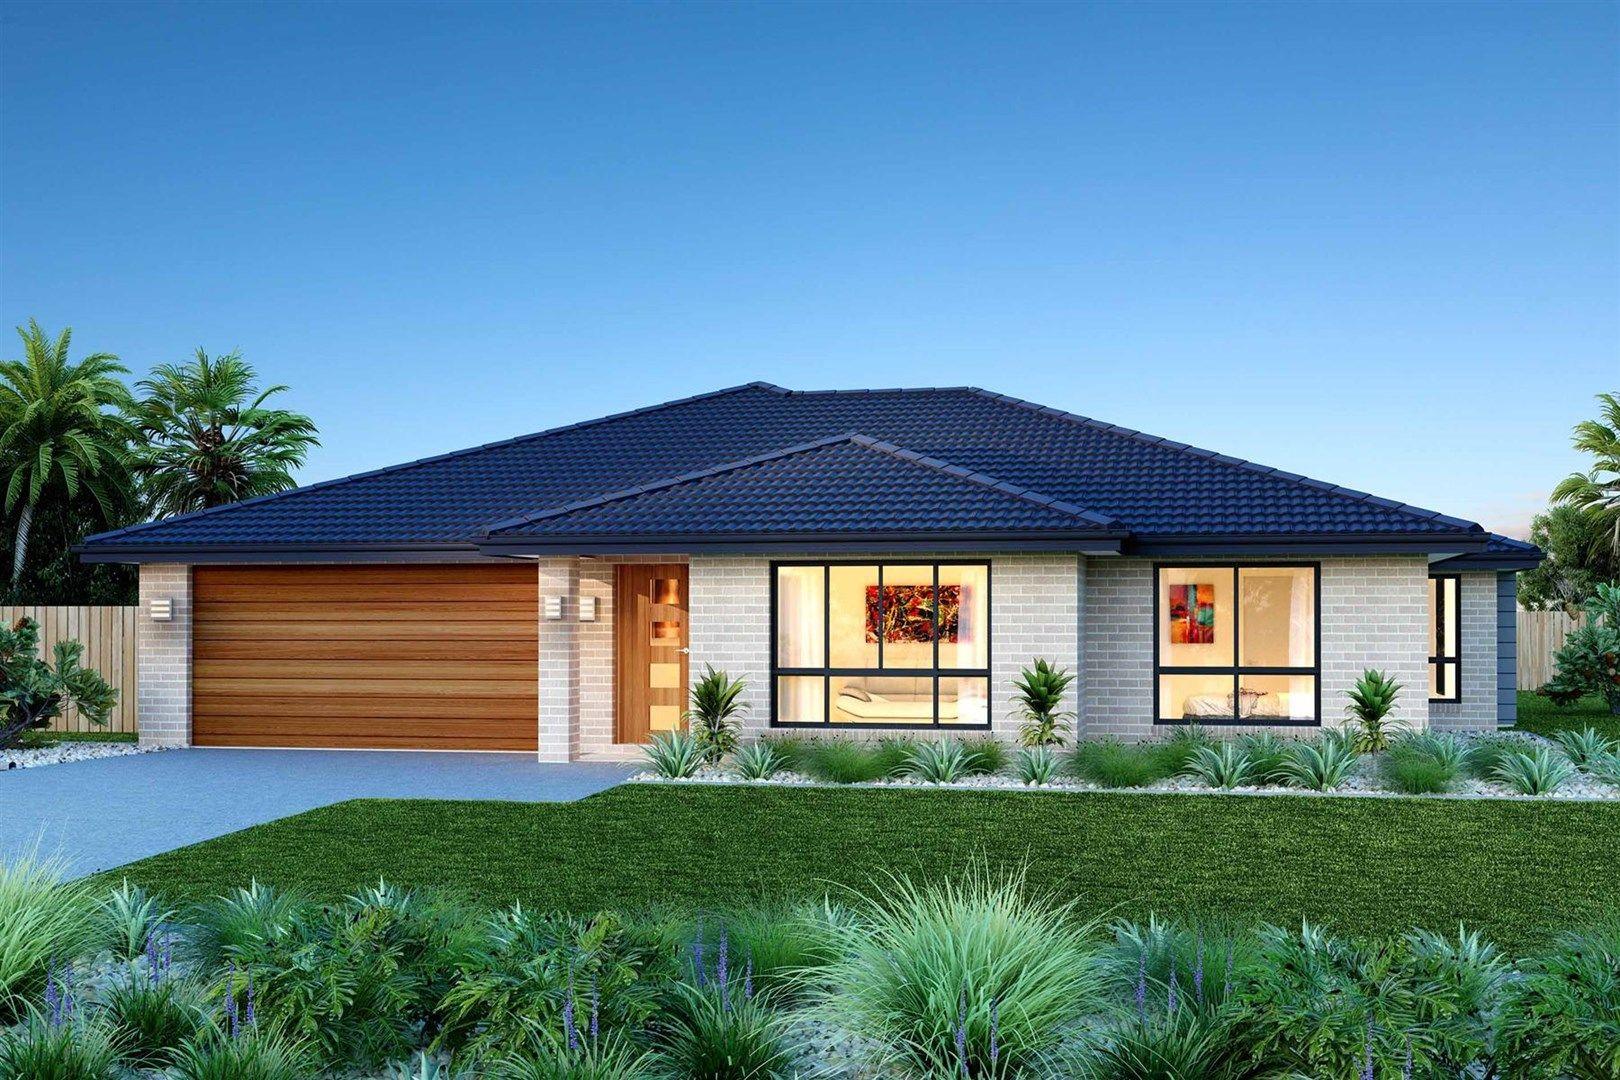 Lot 120, 8 Terlich Way, Jindera NSW 2642, Image 0